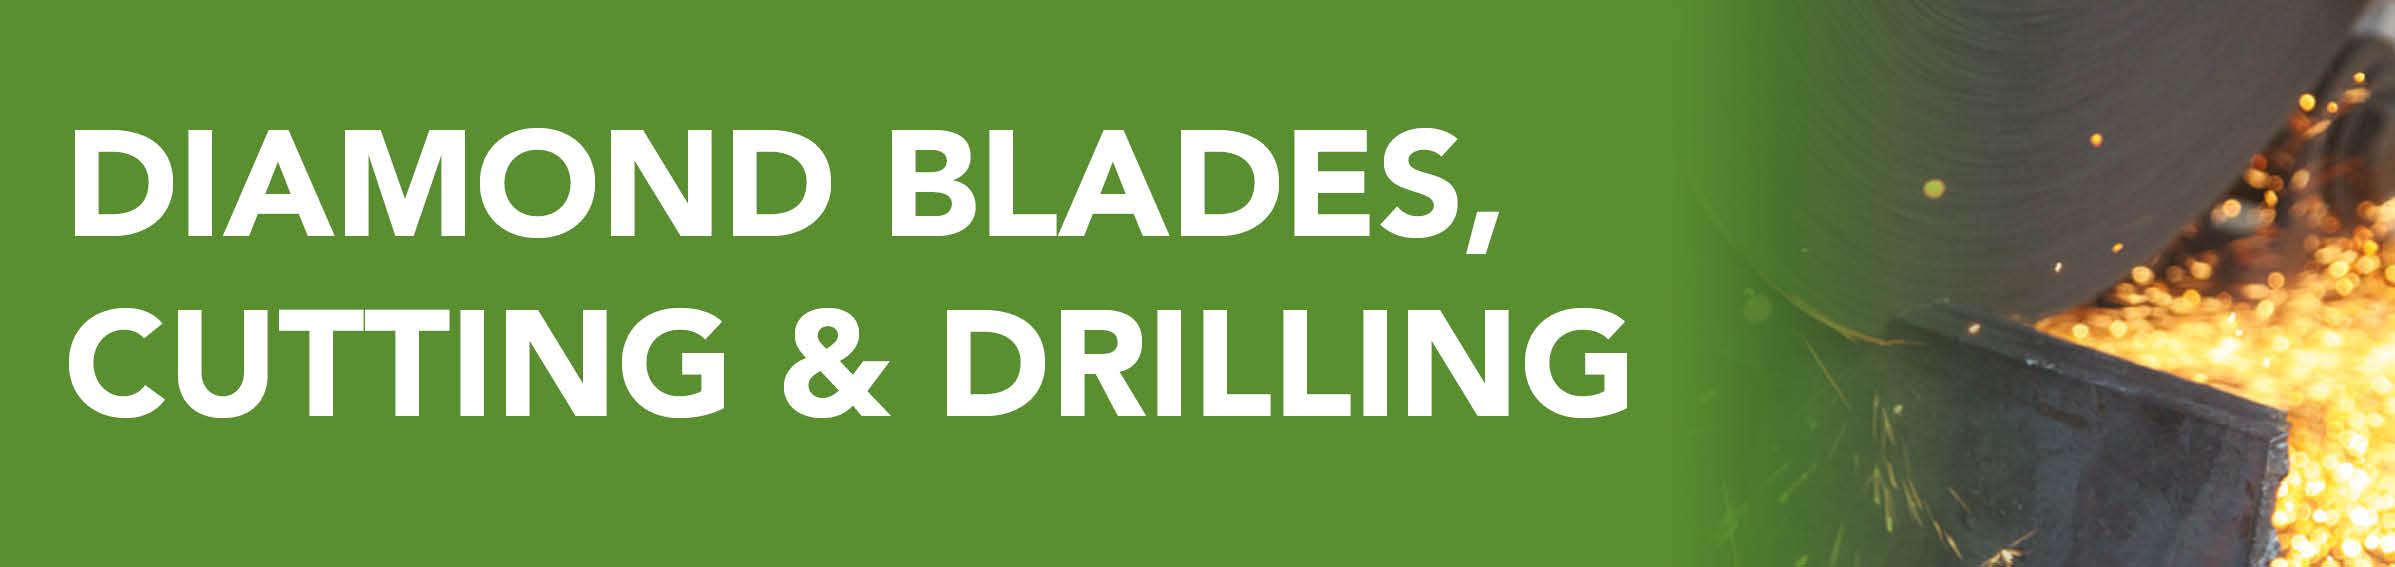 Diamond Blades, Cutting & Drilling